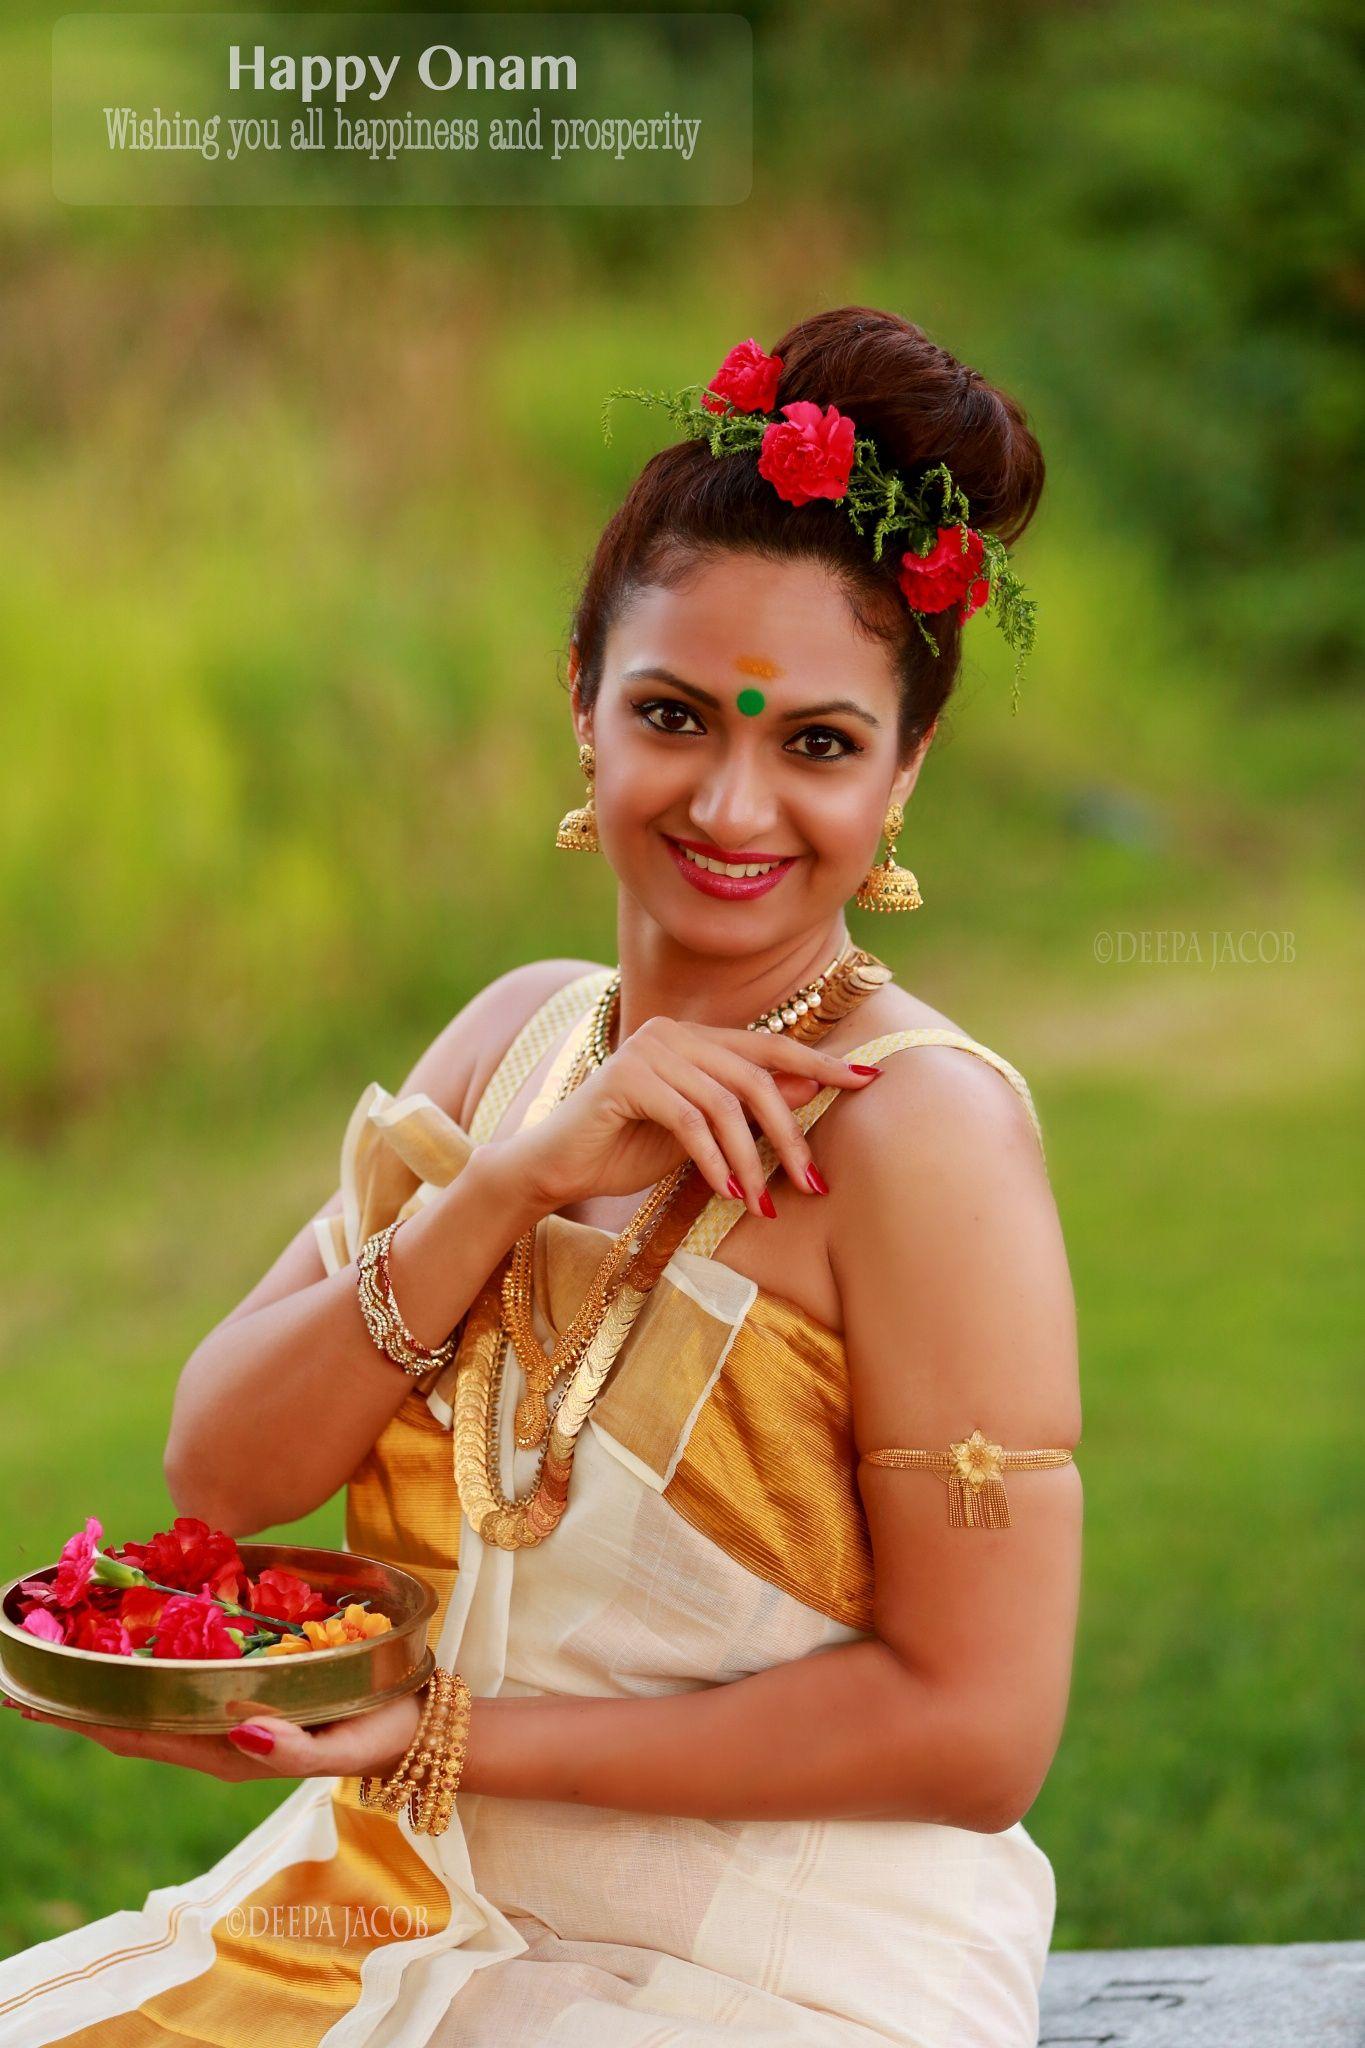 Happy Onam! by Deepa Jacob / 500px in 2019 Happy onam